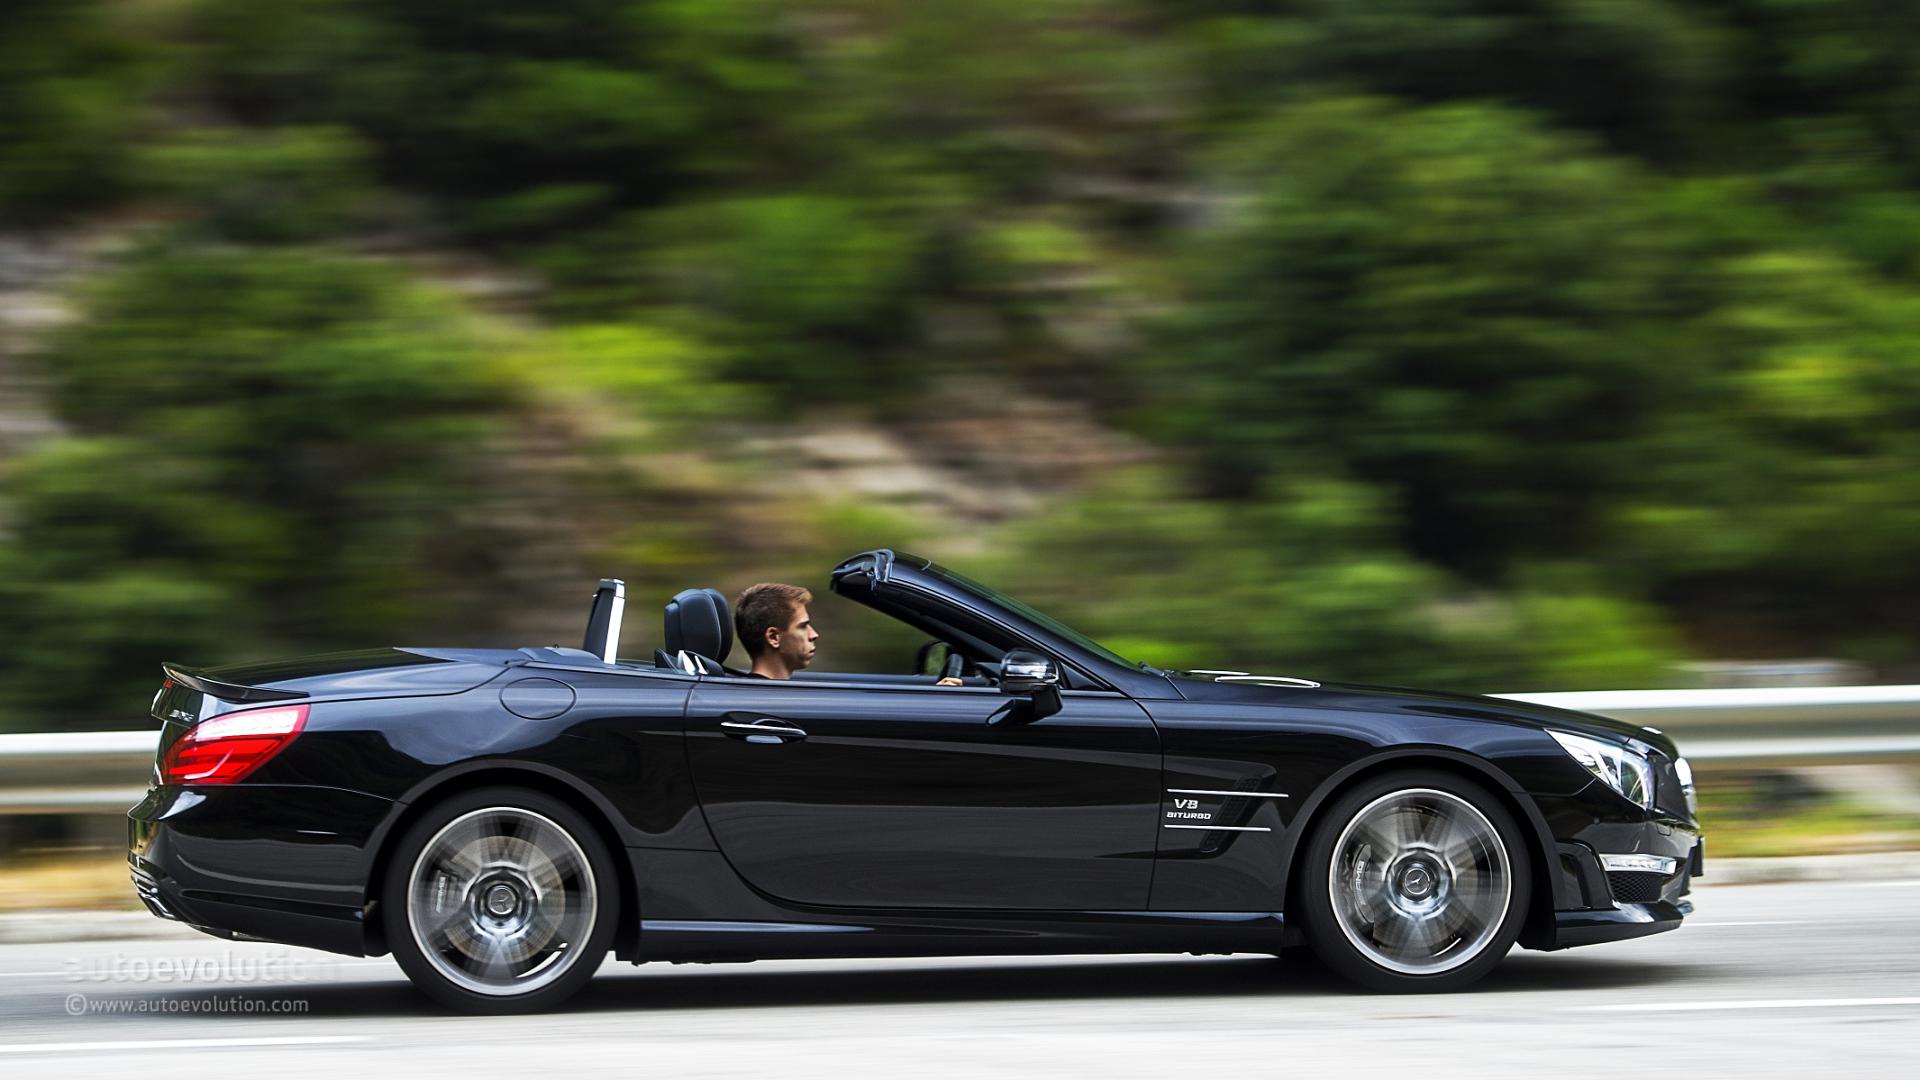 Mercedes benz sl63 amg review autoevolution for Mercedes benz amg sl63